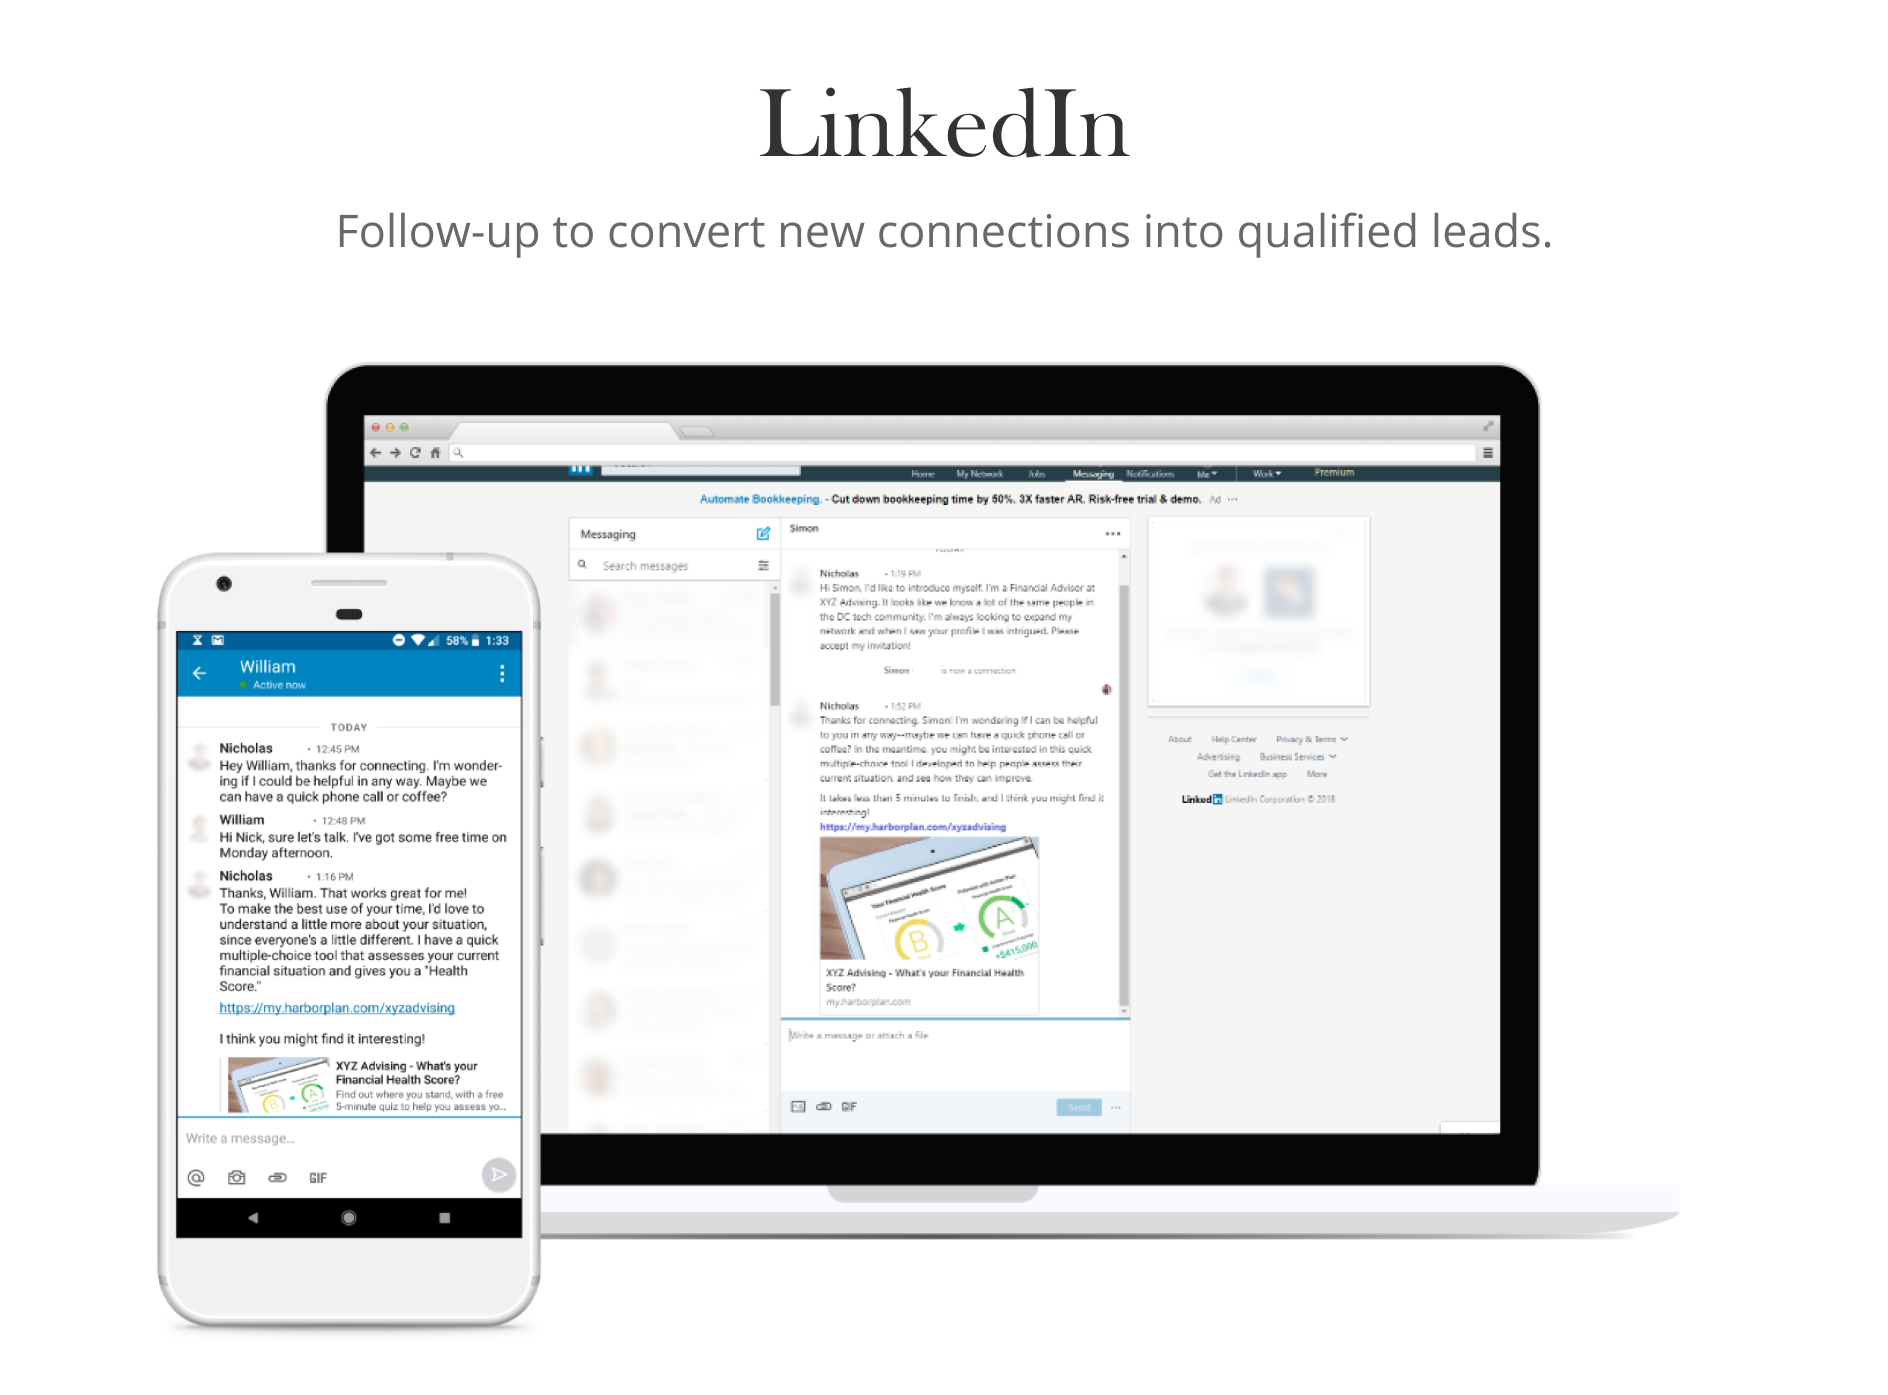 LeadMagnet_LinkedIn.png